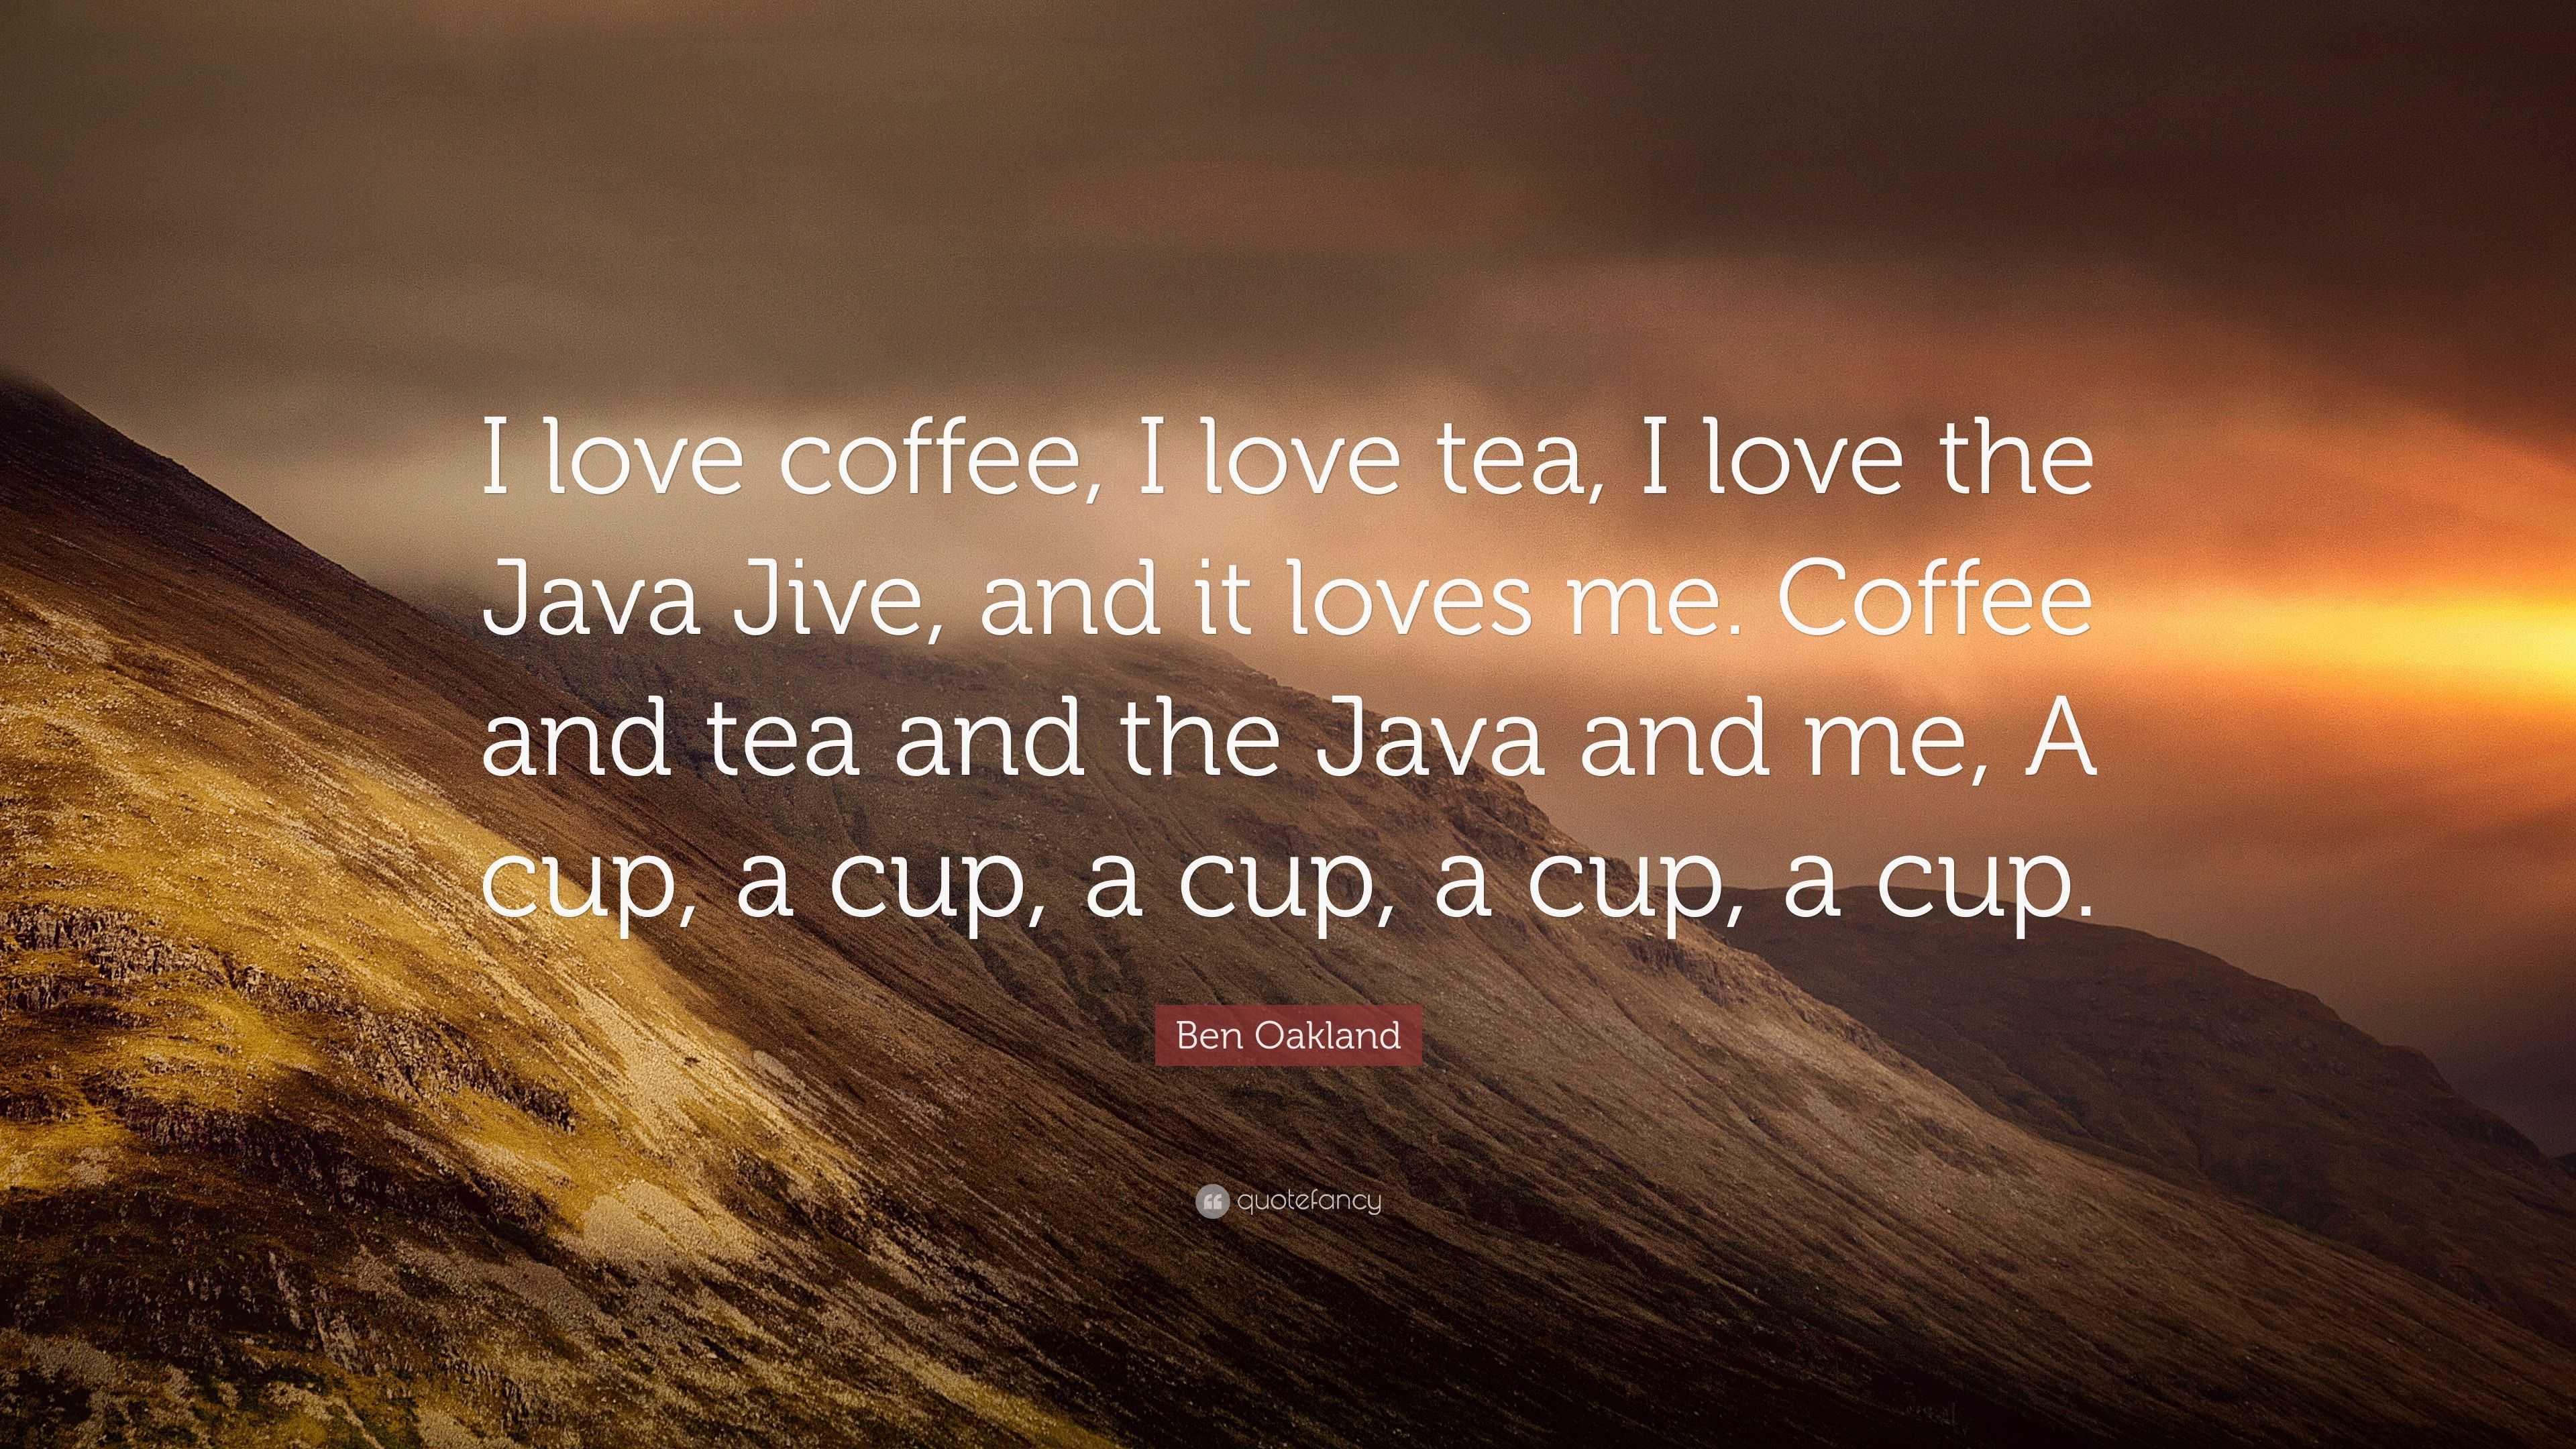 Ben oakland quote i love coffee i love tea i love the java jive